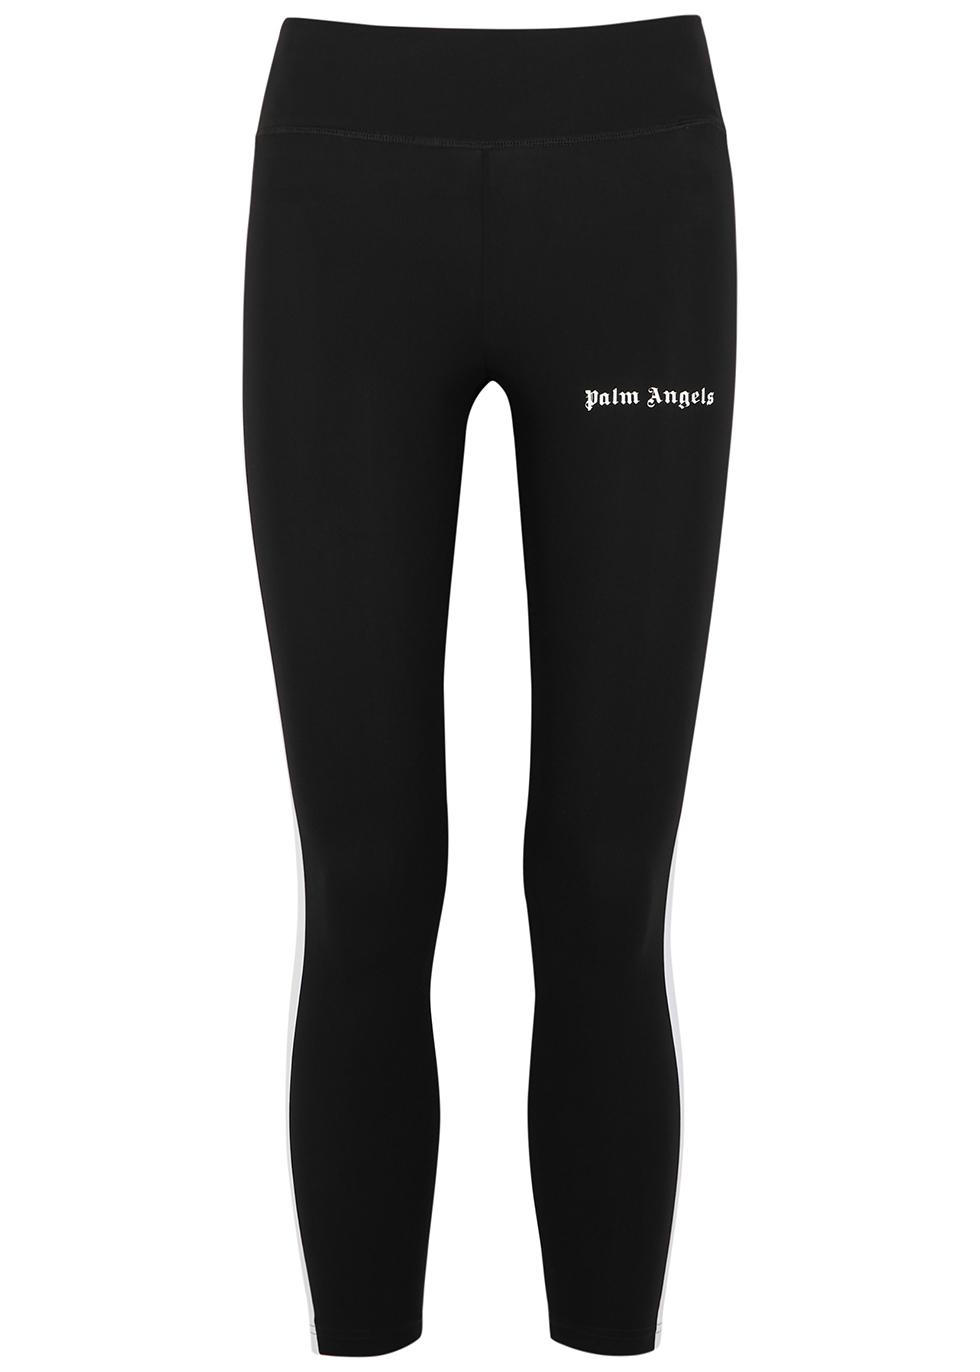 Black striped cropped leggings